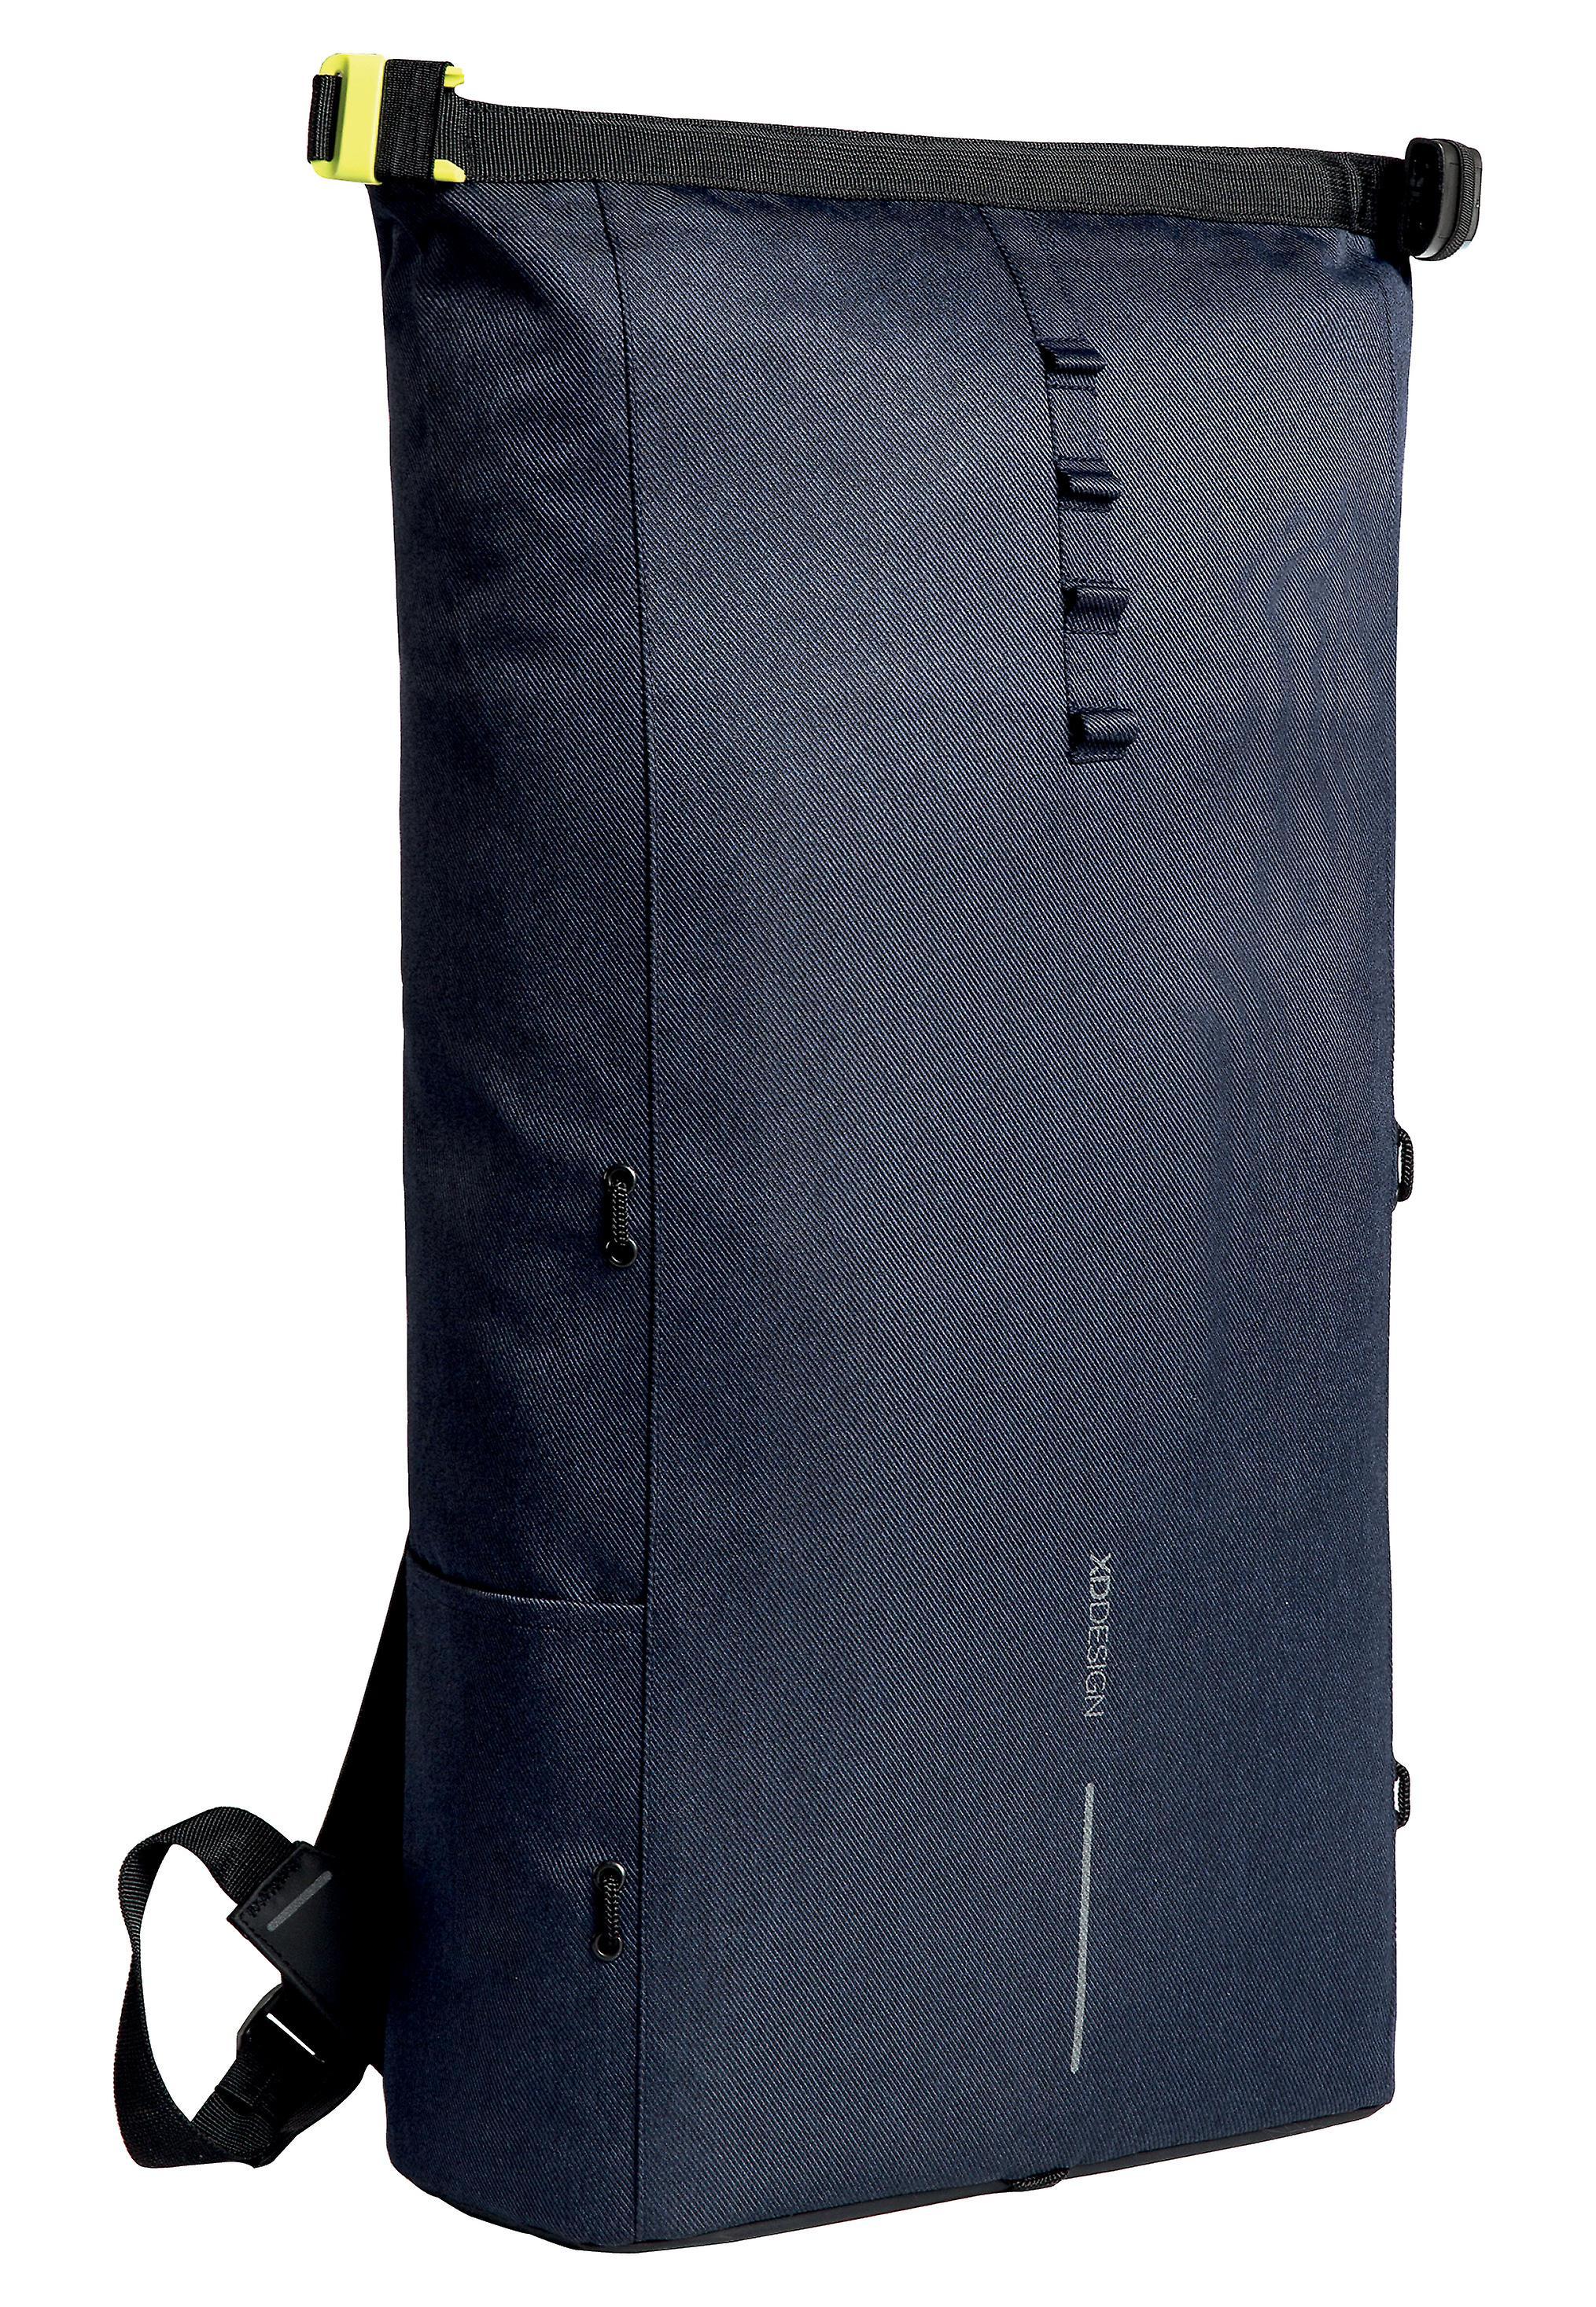 XD Design Urban Lite Anti-Theft Laptop Backpack (Unisex Travel Bag)